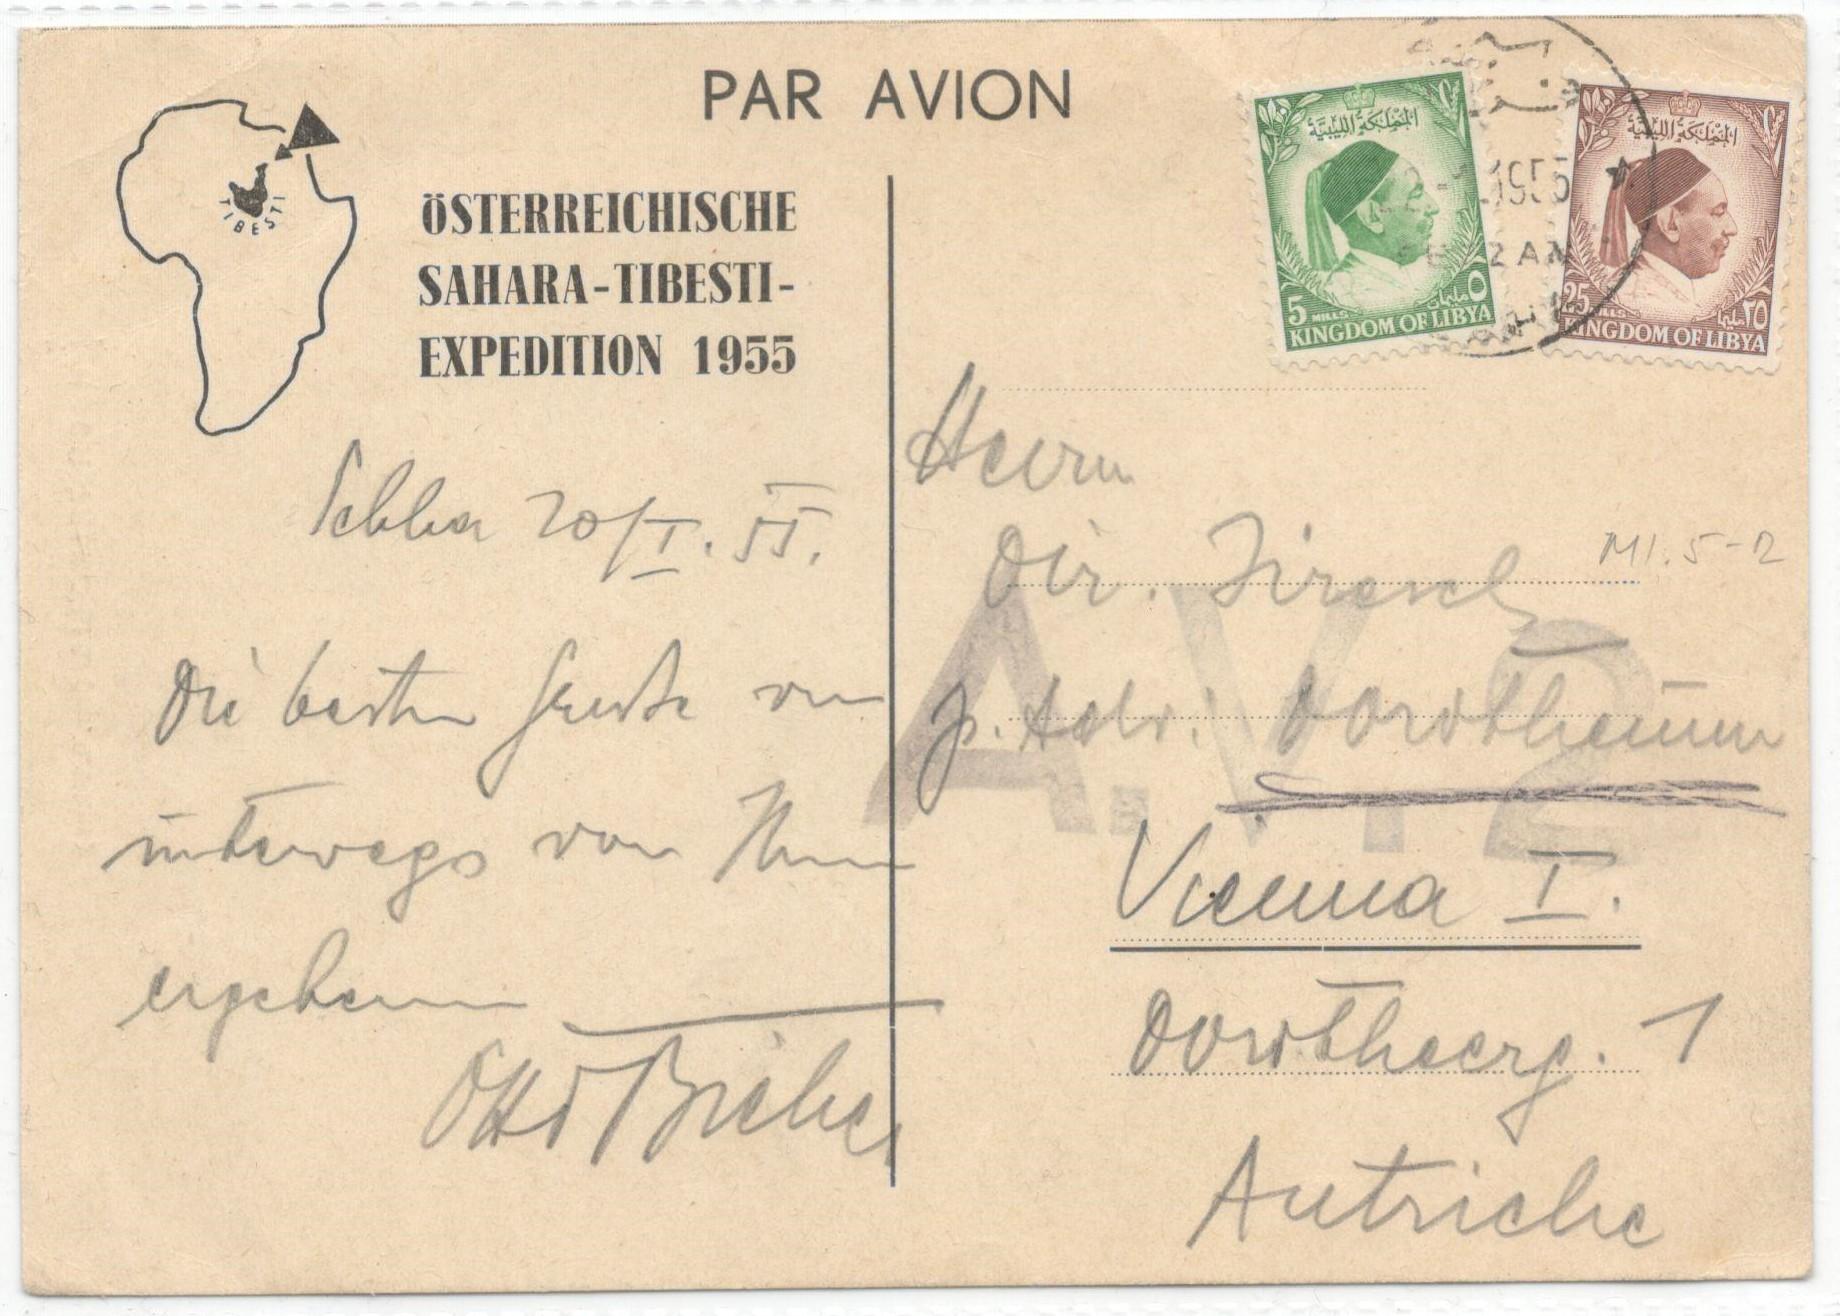 THE AUSTRIAN SAHARA TIBESTI EXPEDITION 1955 POSTCARD - Image 2 of 2